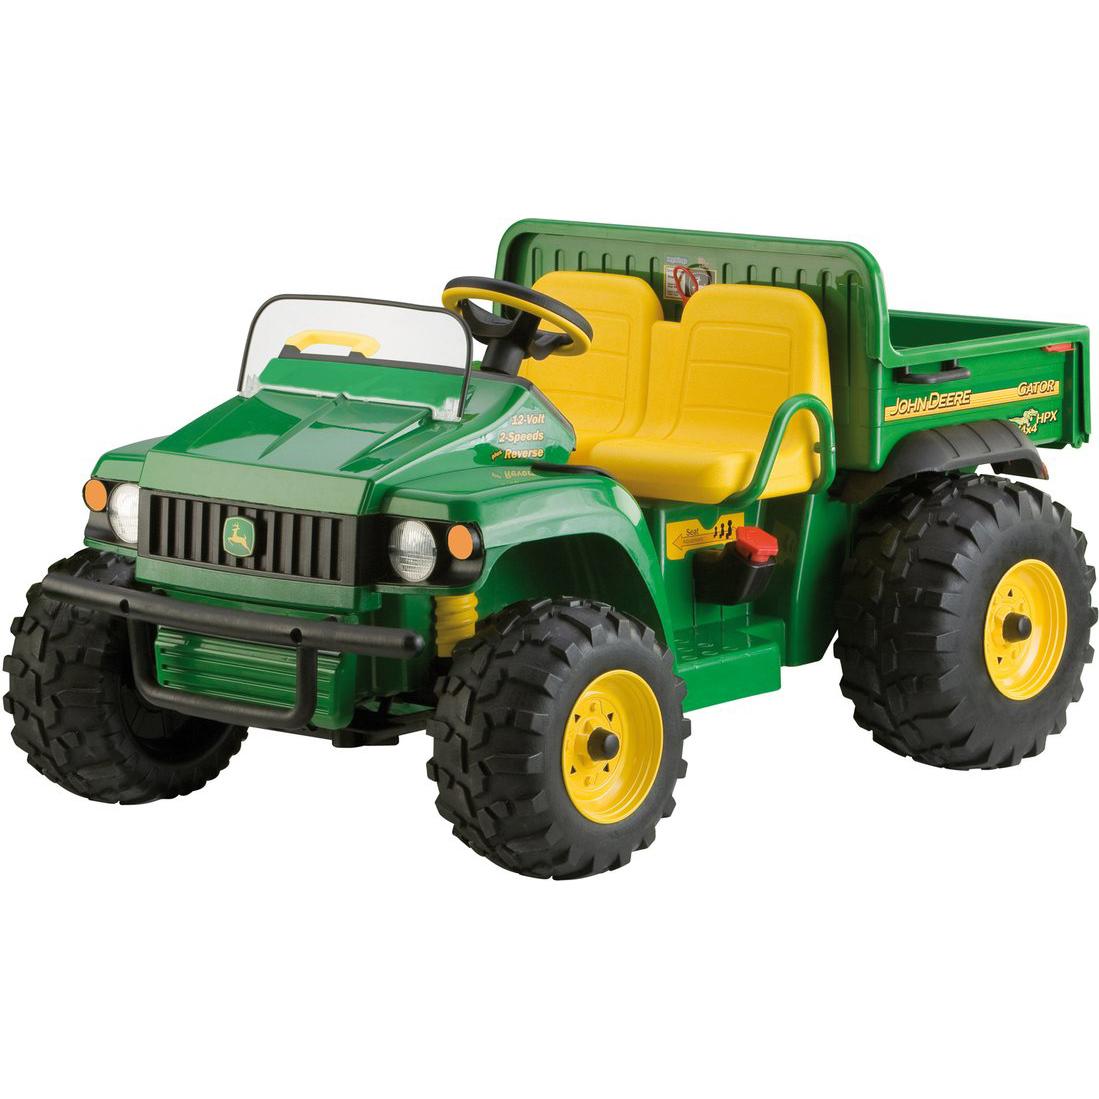 Peg-Perego JD Gator HPX Green